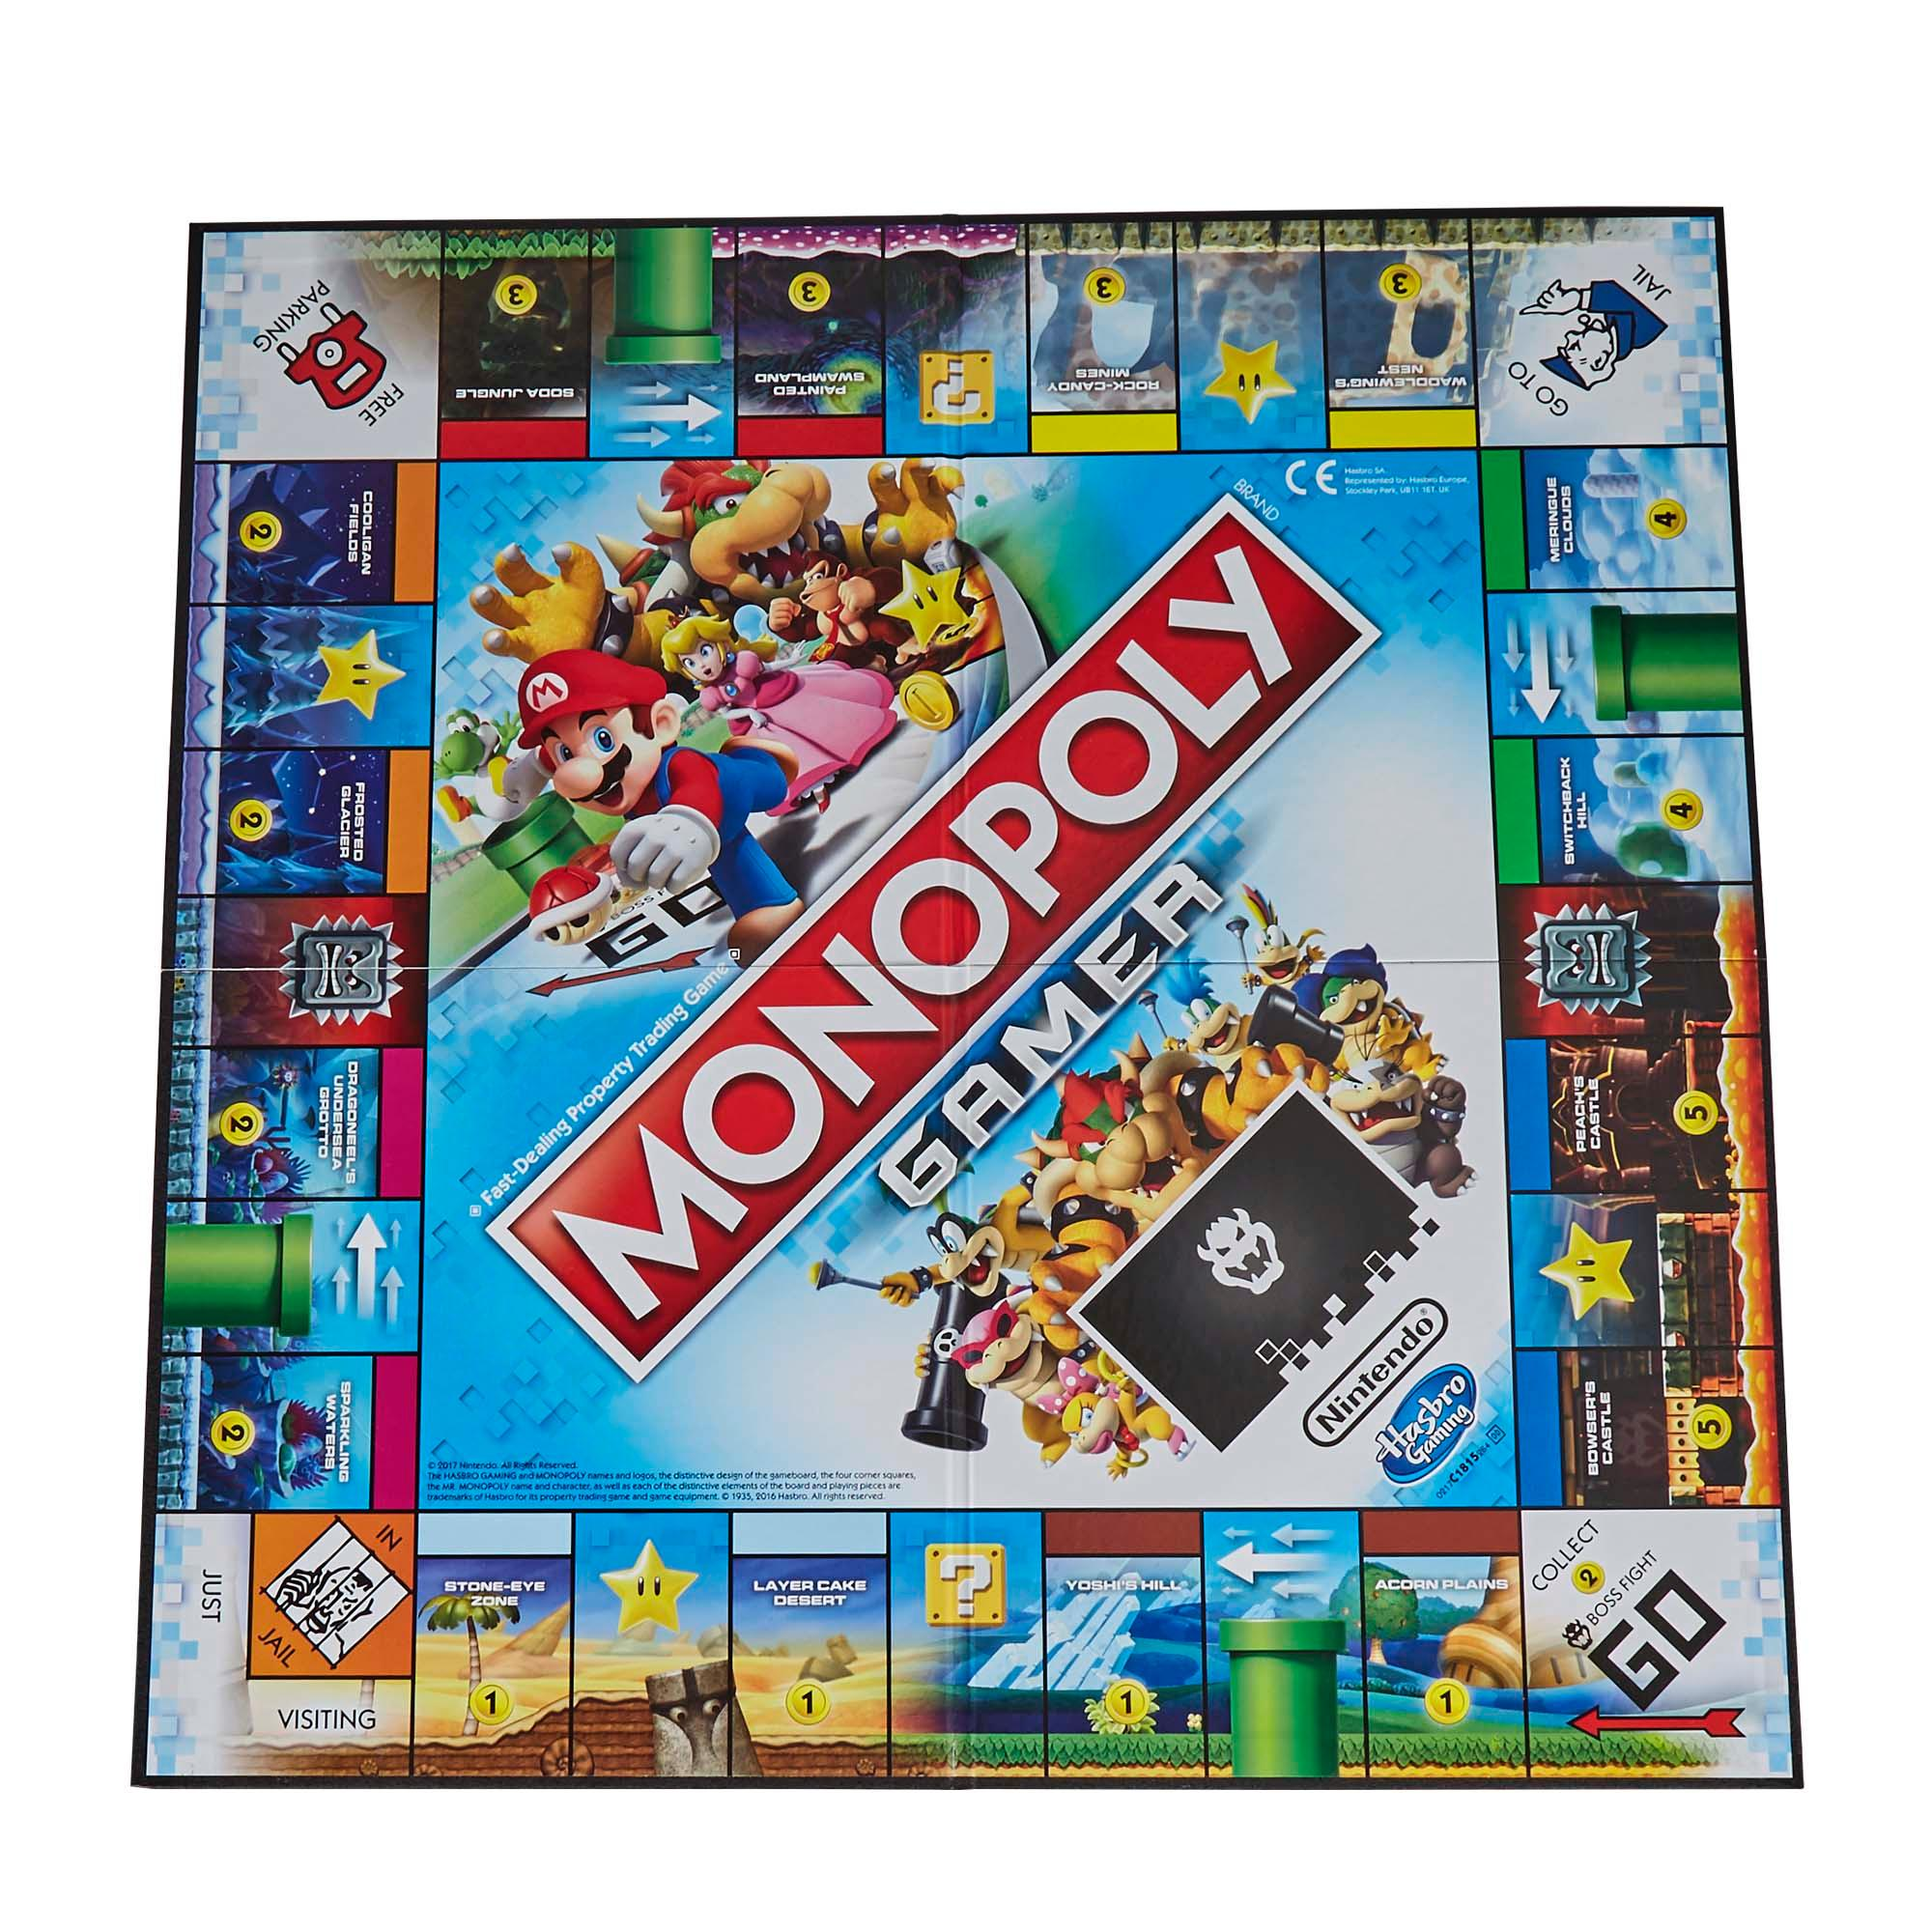 Hasbro Reveals Monopoly Gamer New Take On Monopoly